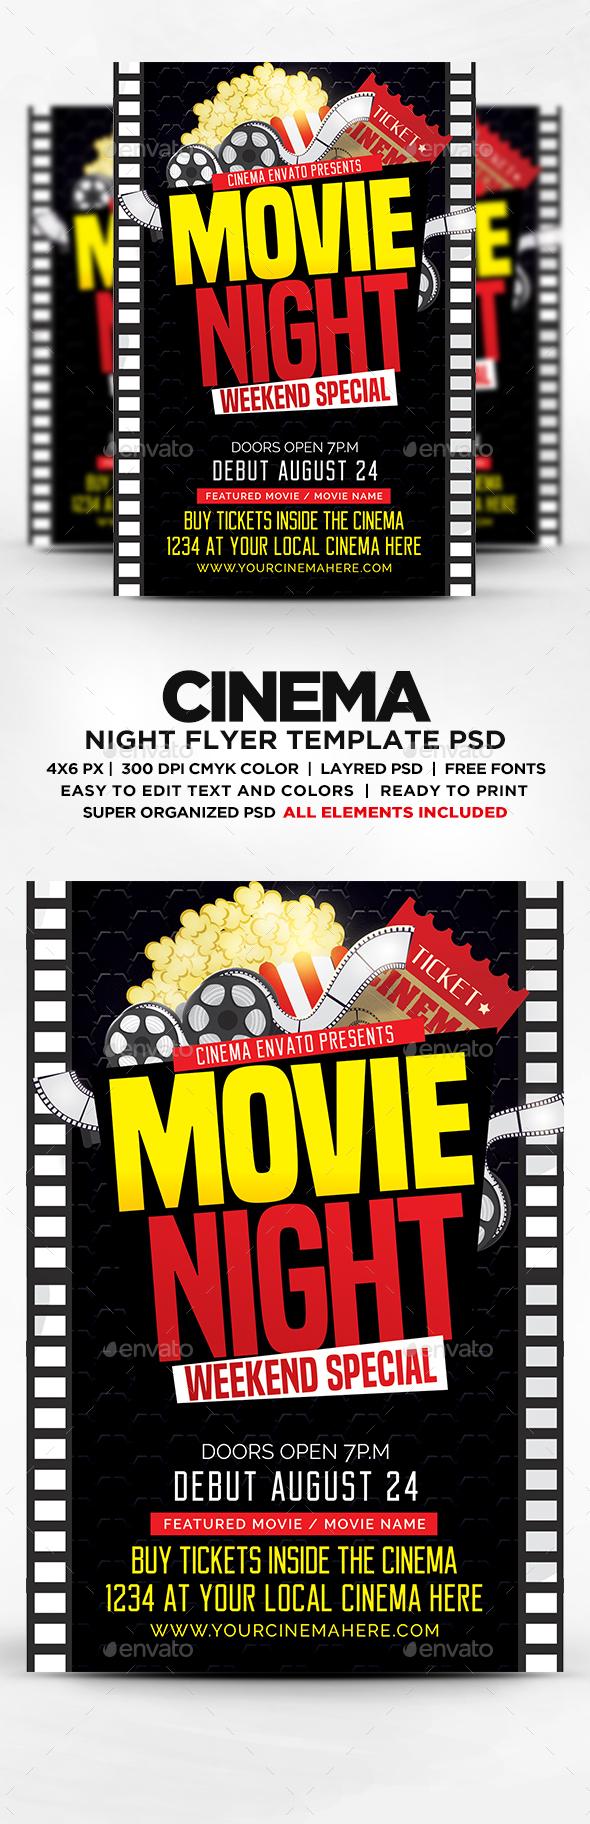 Movie Night Flyer Template PSD by DESIGNBLEND – Movie Night Flyer Template